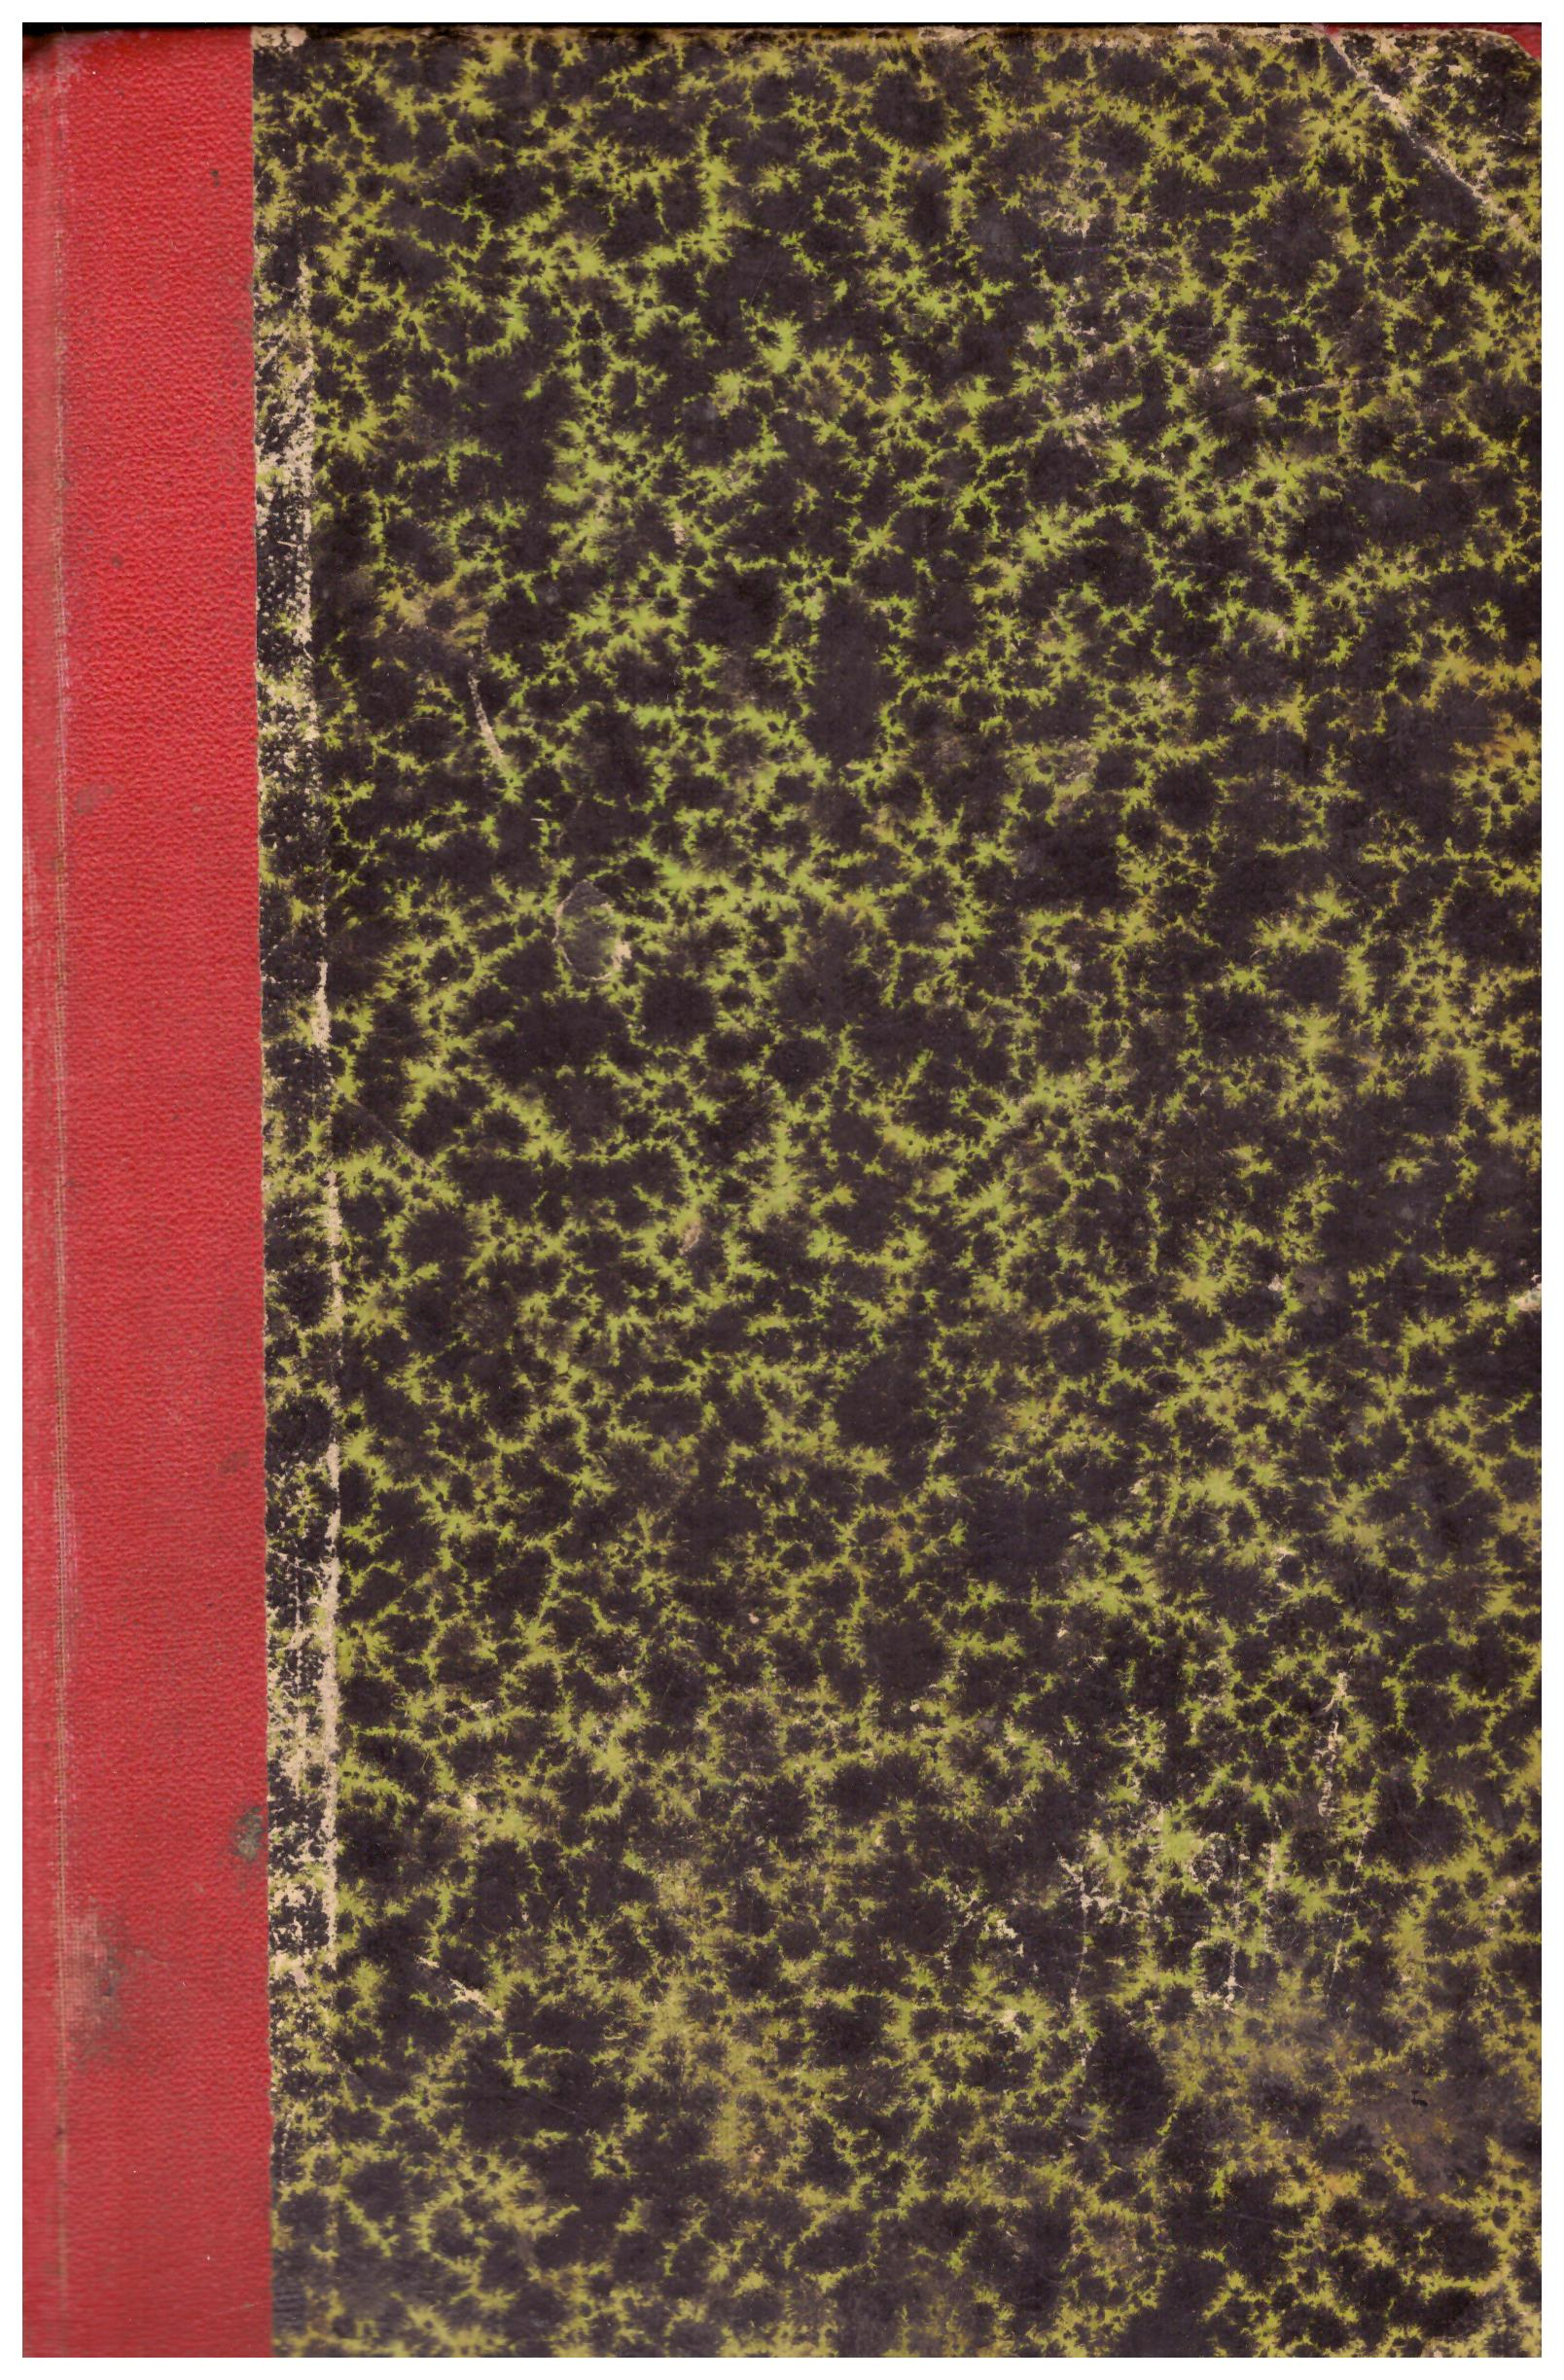 Titolo: Summa Theologica in 6 volumi Autore: Divi Thomae Aquinatis Editore: Ex Typographia Senatus, Romae MDCCCLXXXVI